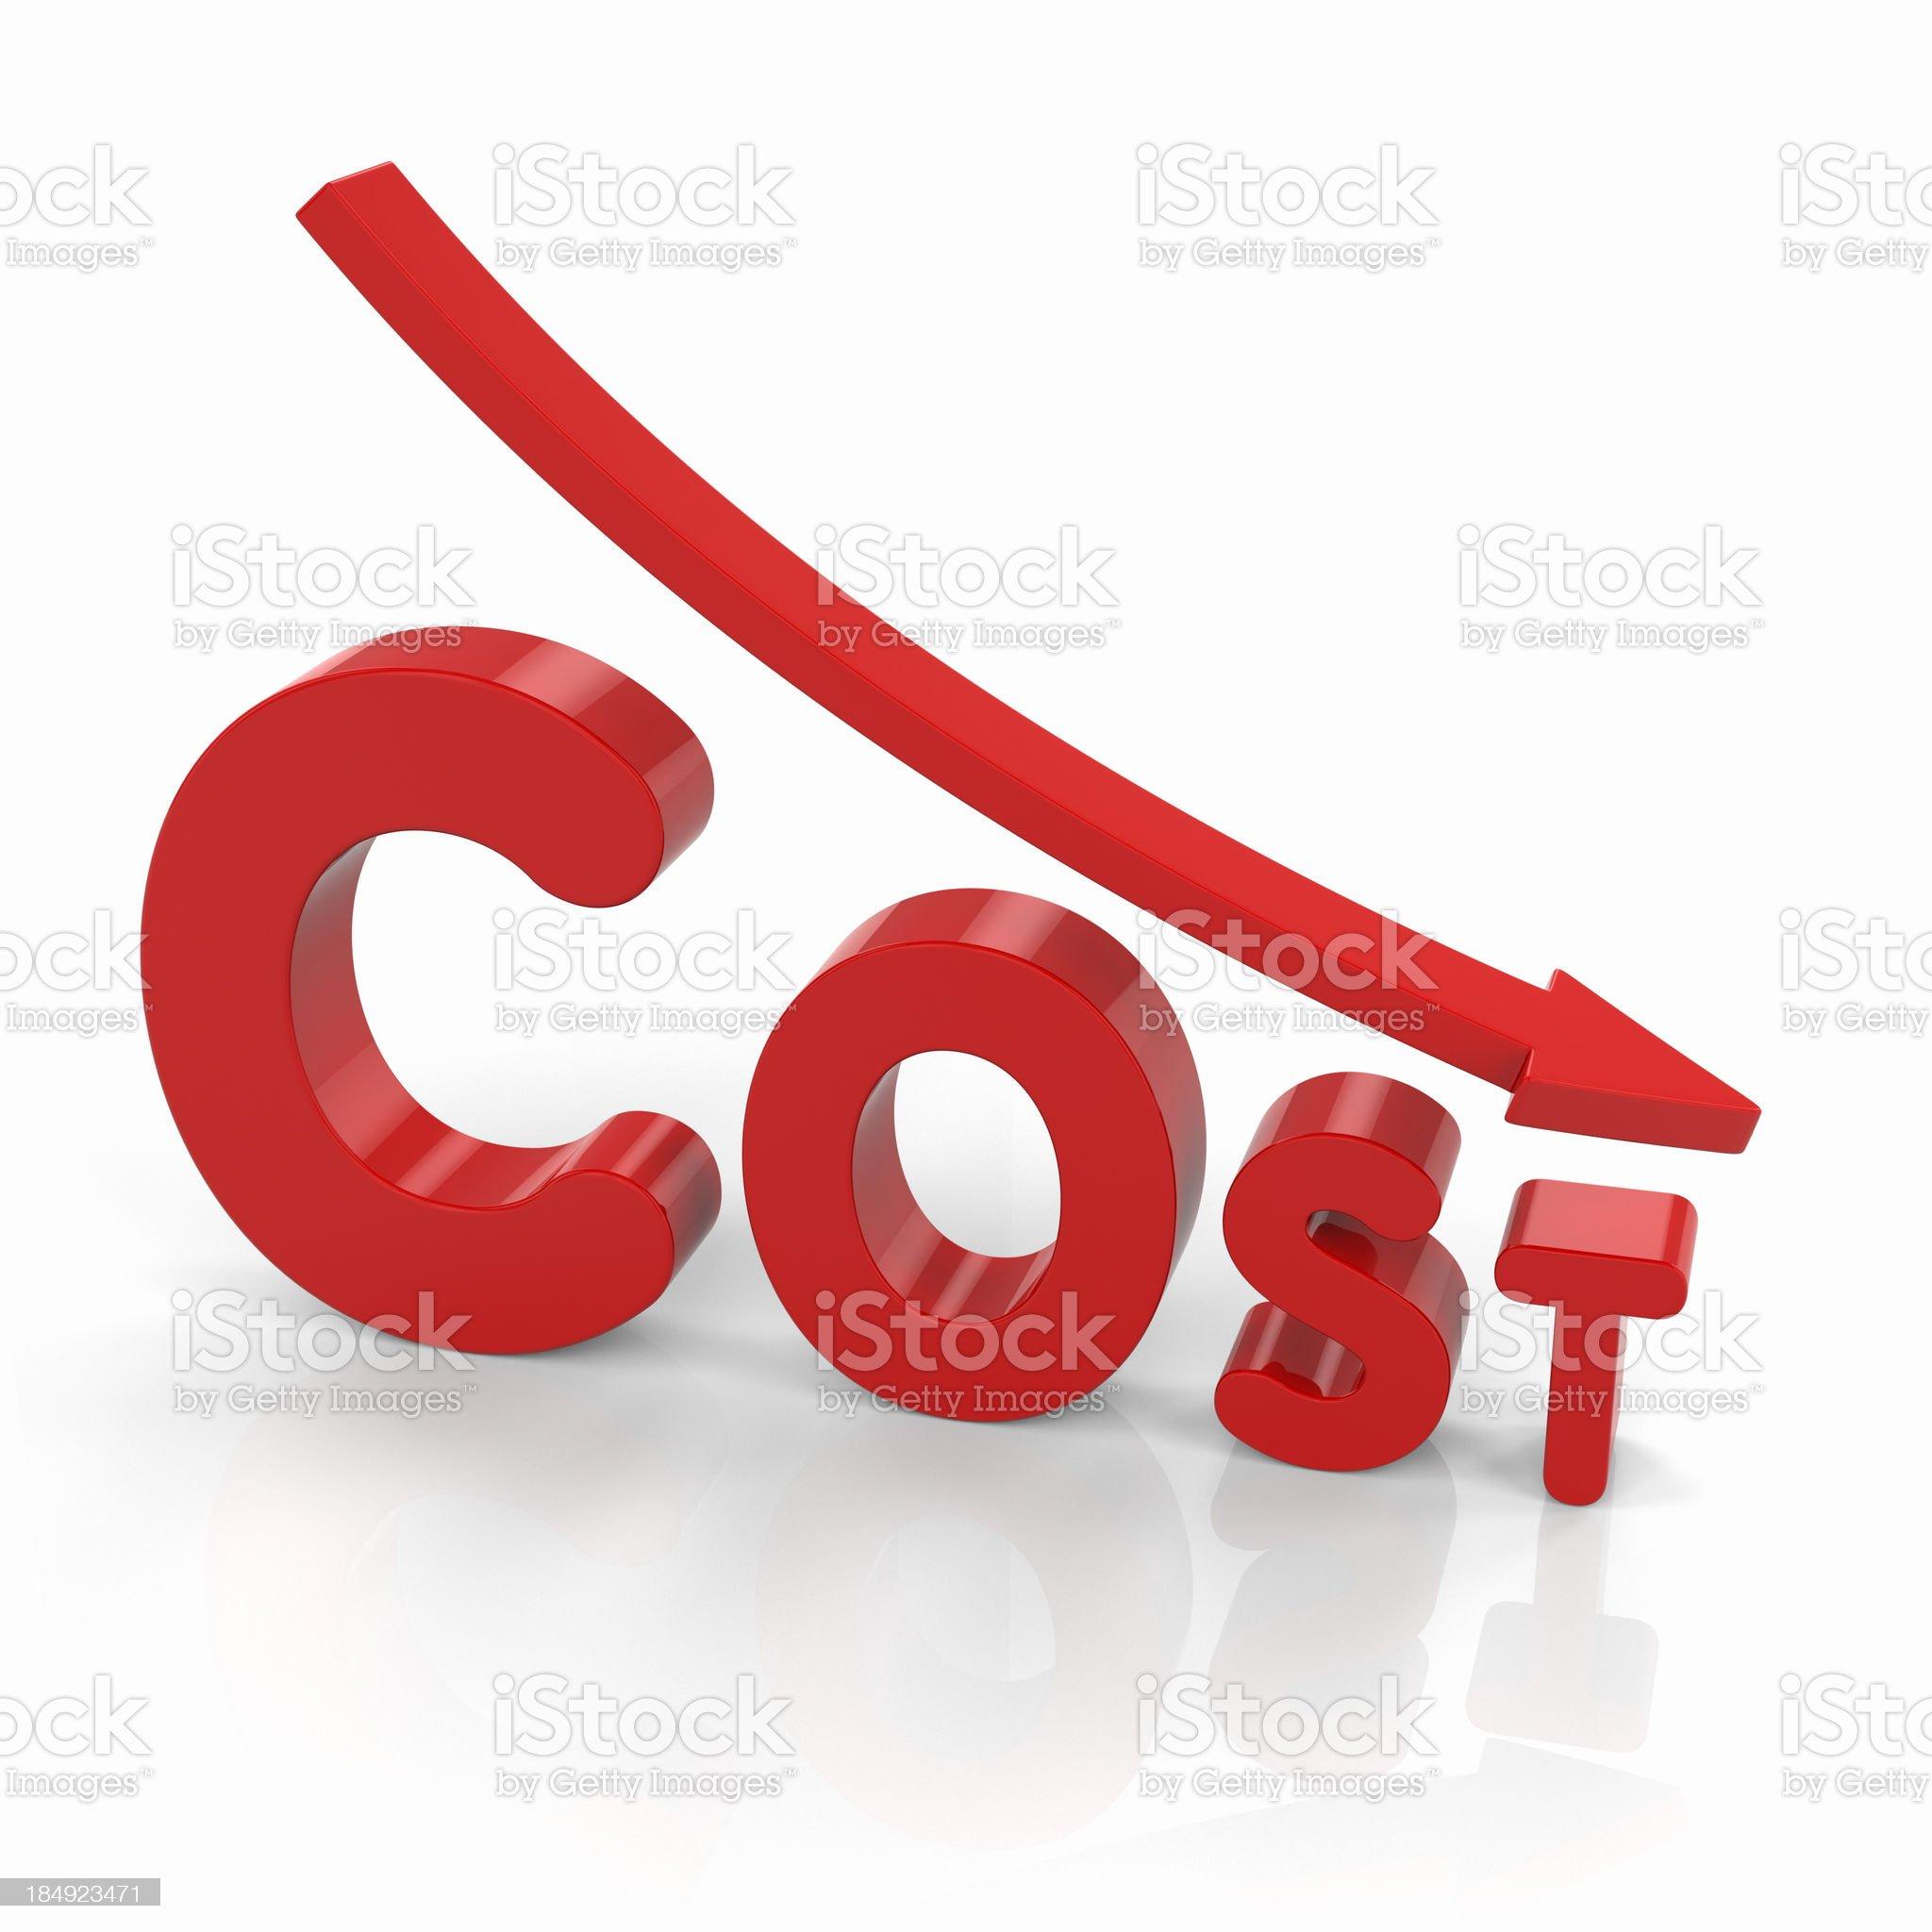 Cost Minimization royalty-free stock photo